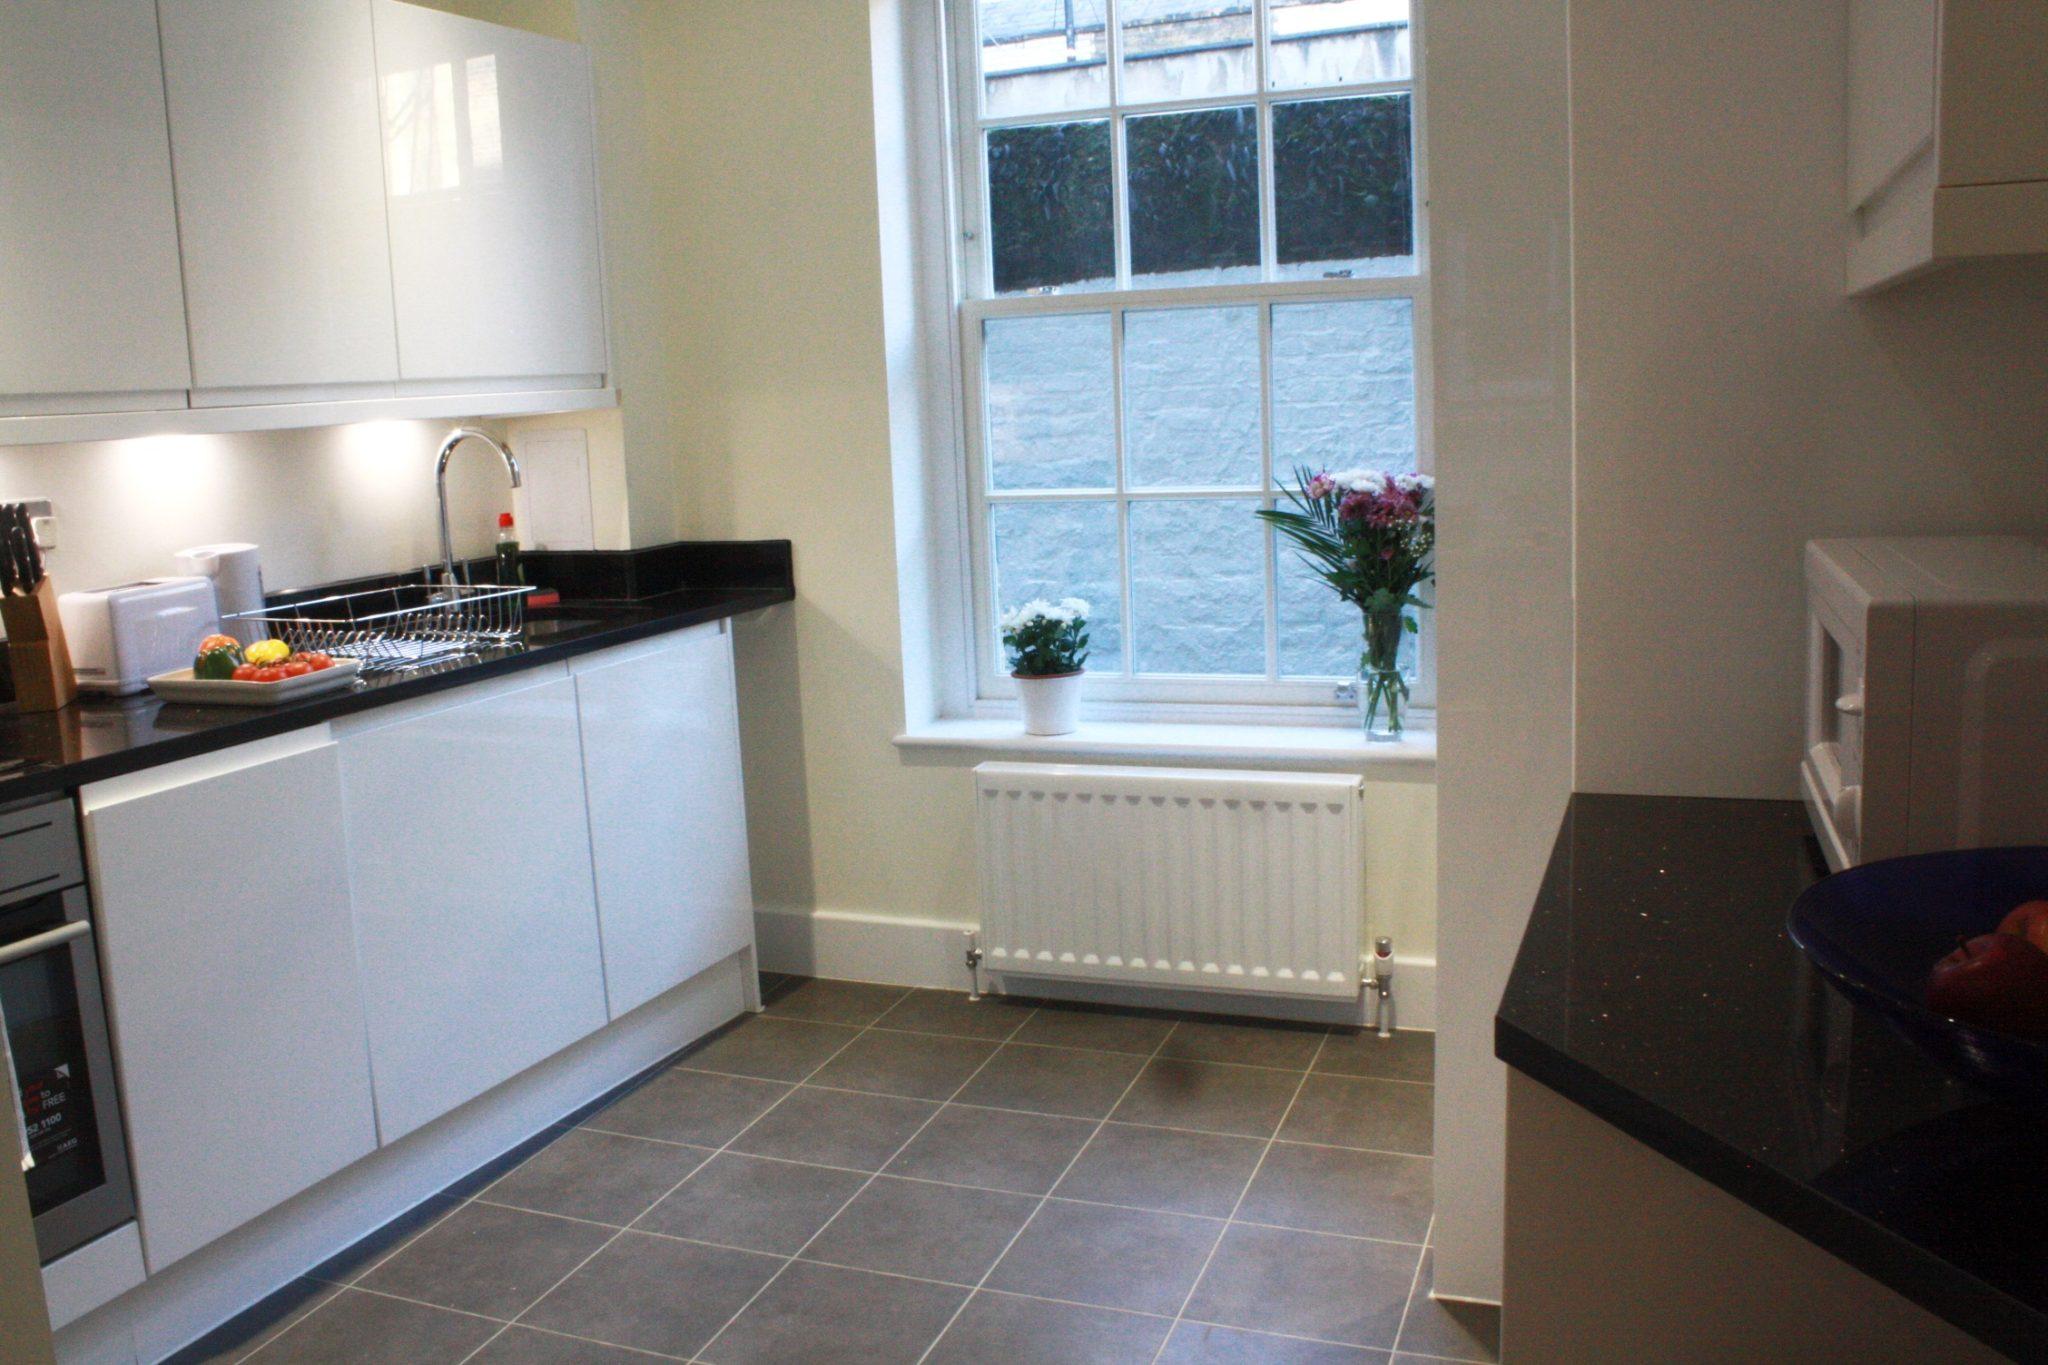 Liverpool Street Serviced Accommodation Artillery Lane Apartments Modern Kitchen